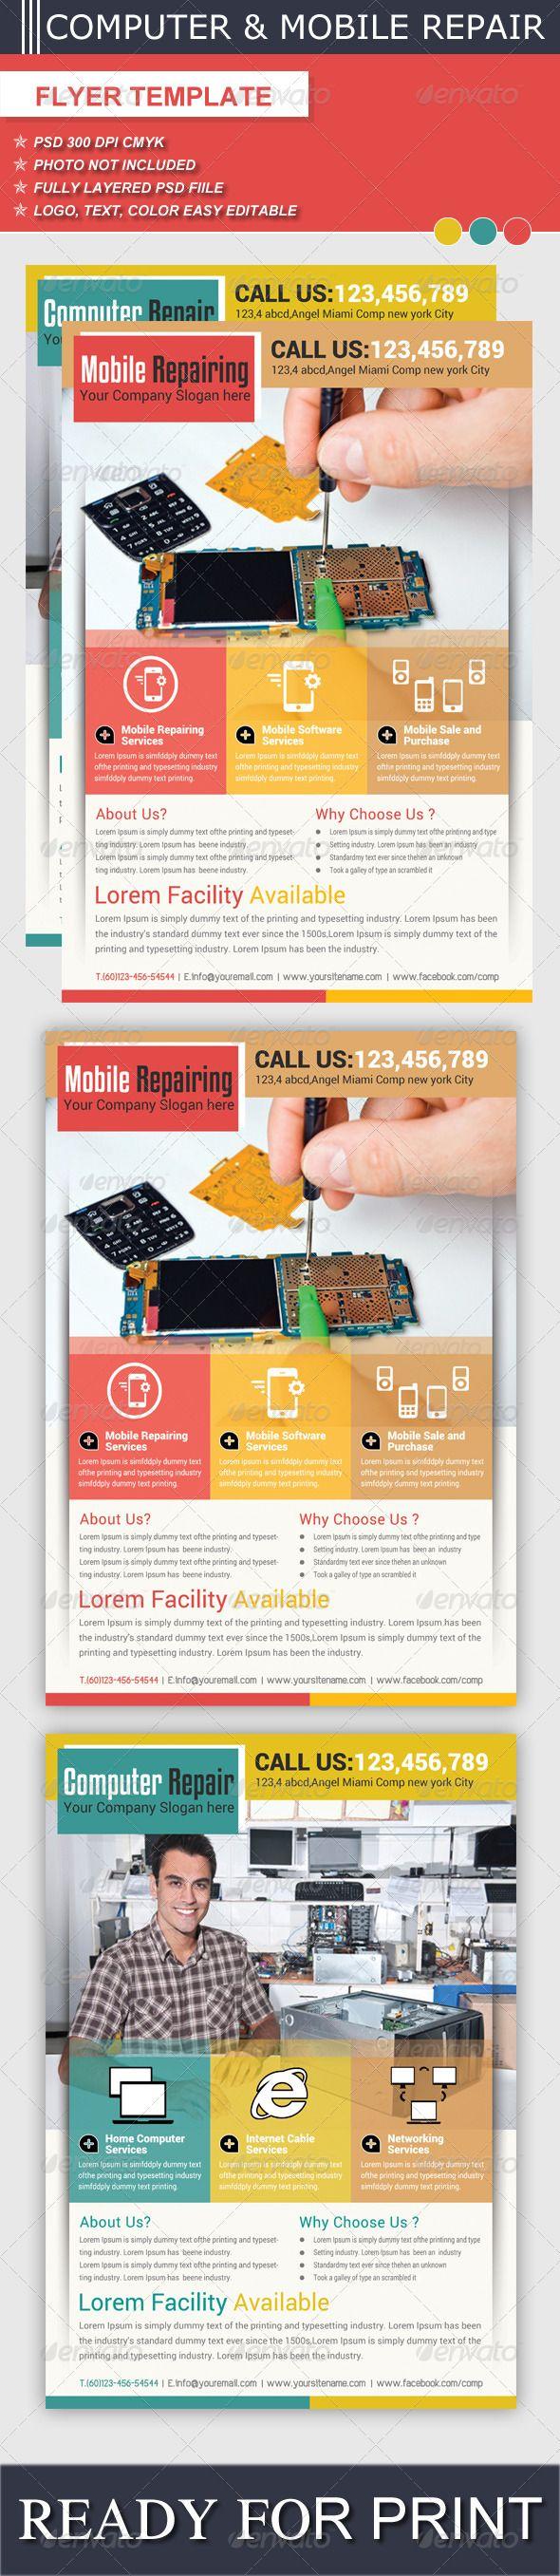 Computer Mobile Repair Flyer Template – Computer Repair Flyer Template